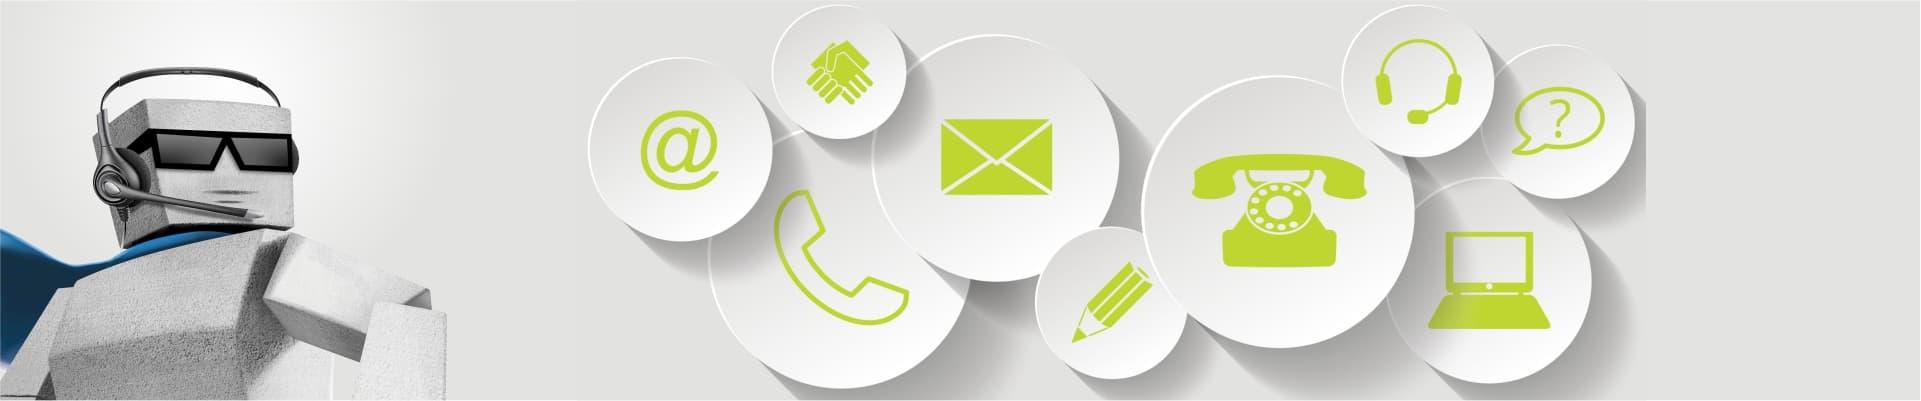 contact-us-magicrete_29032019175310